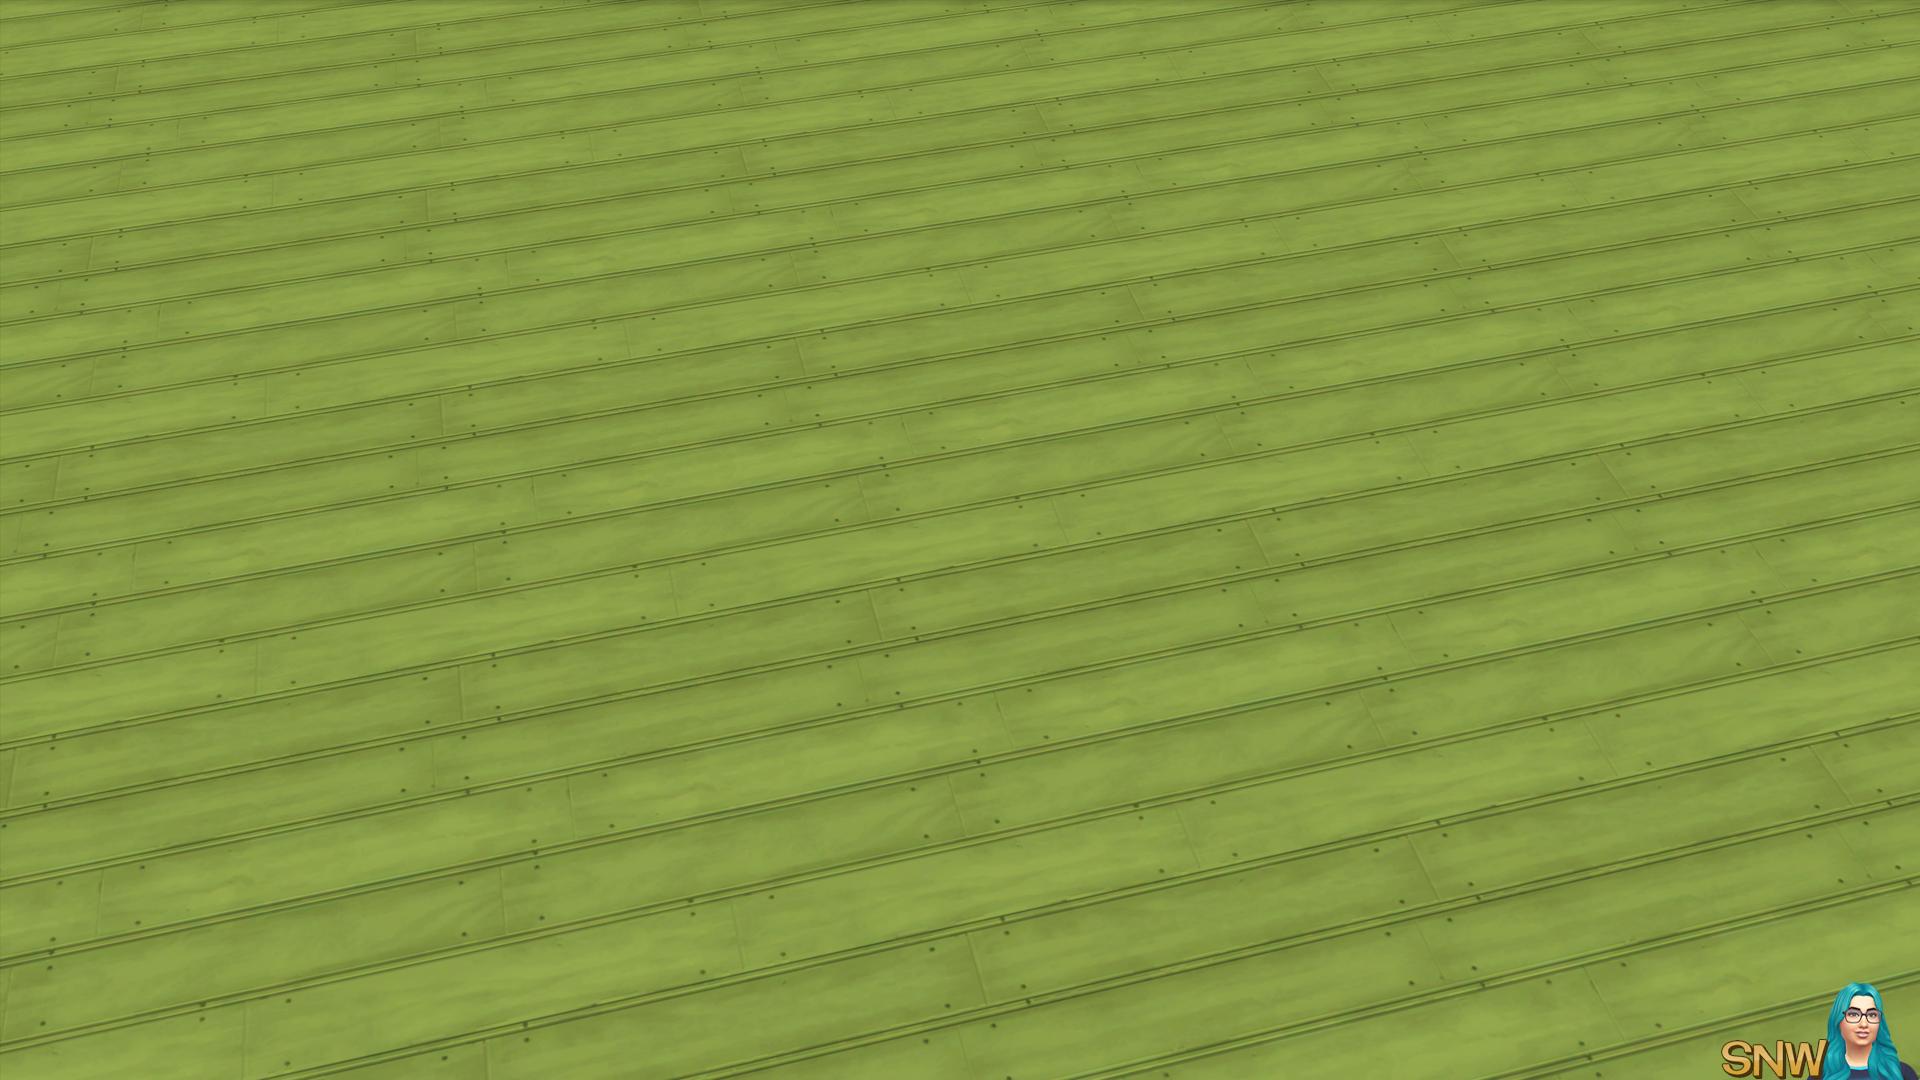 Rustic Subfloor Slats (Small)